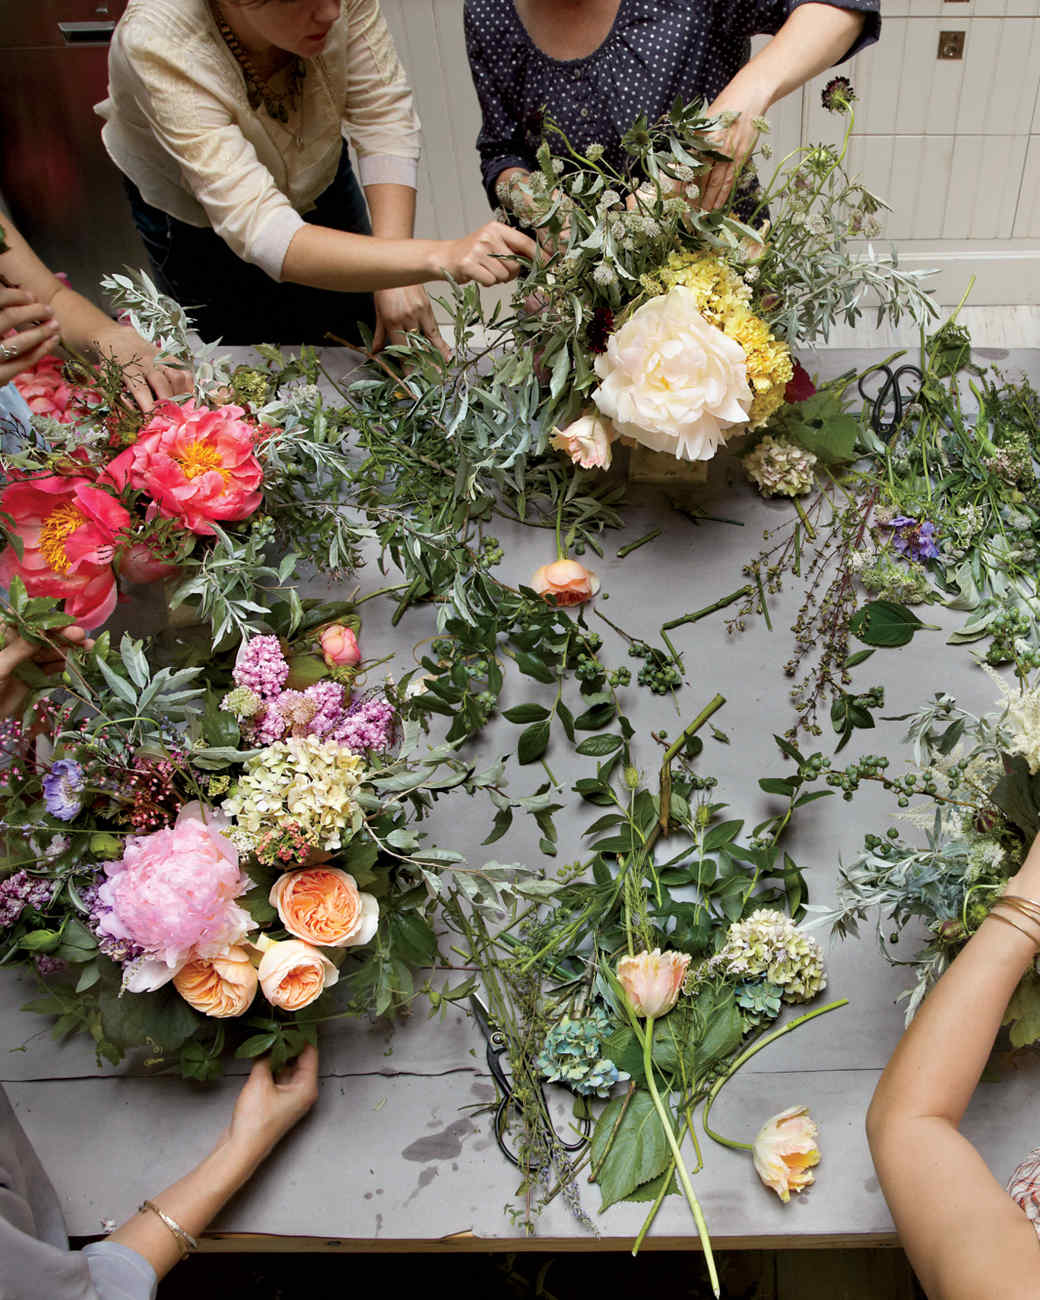 flower-school-mld107663.jpg